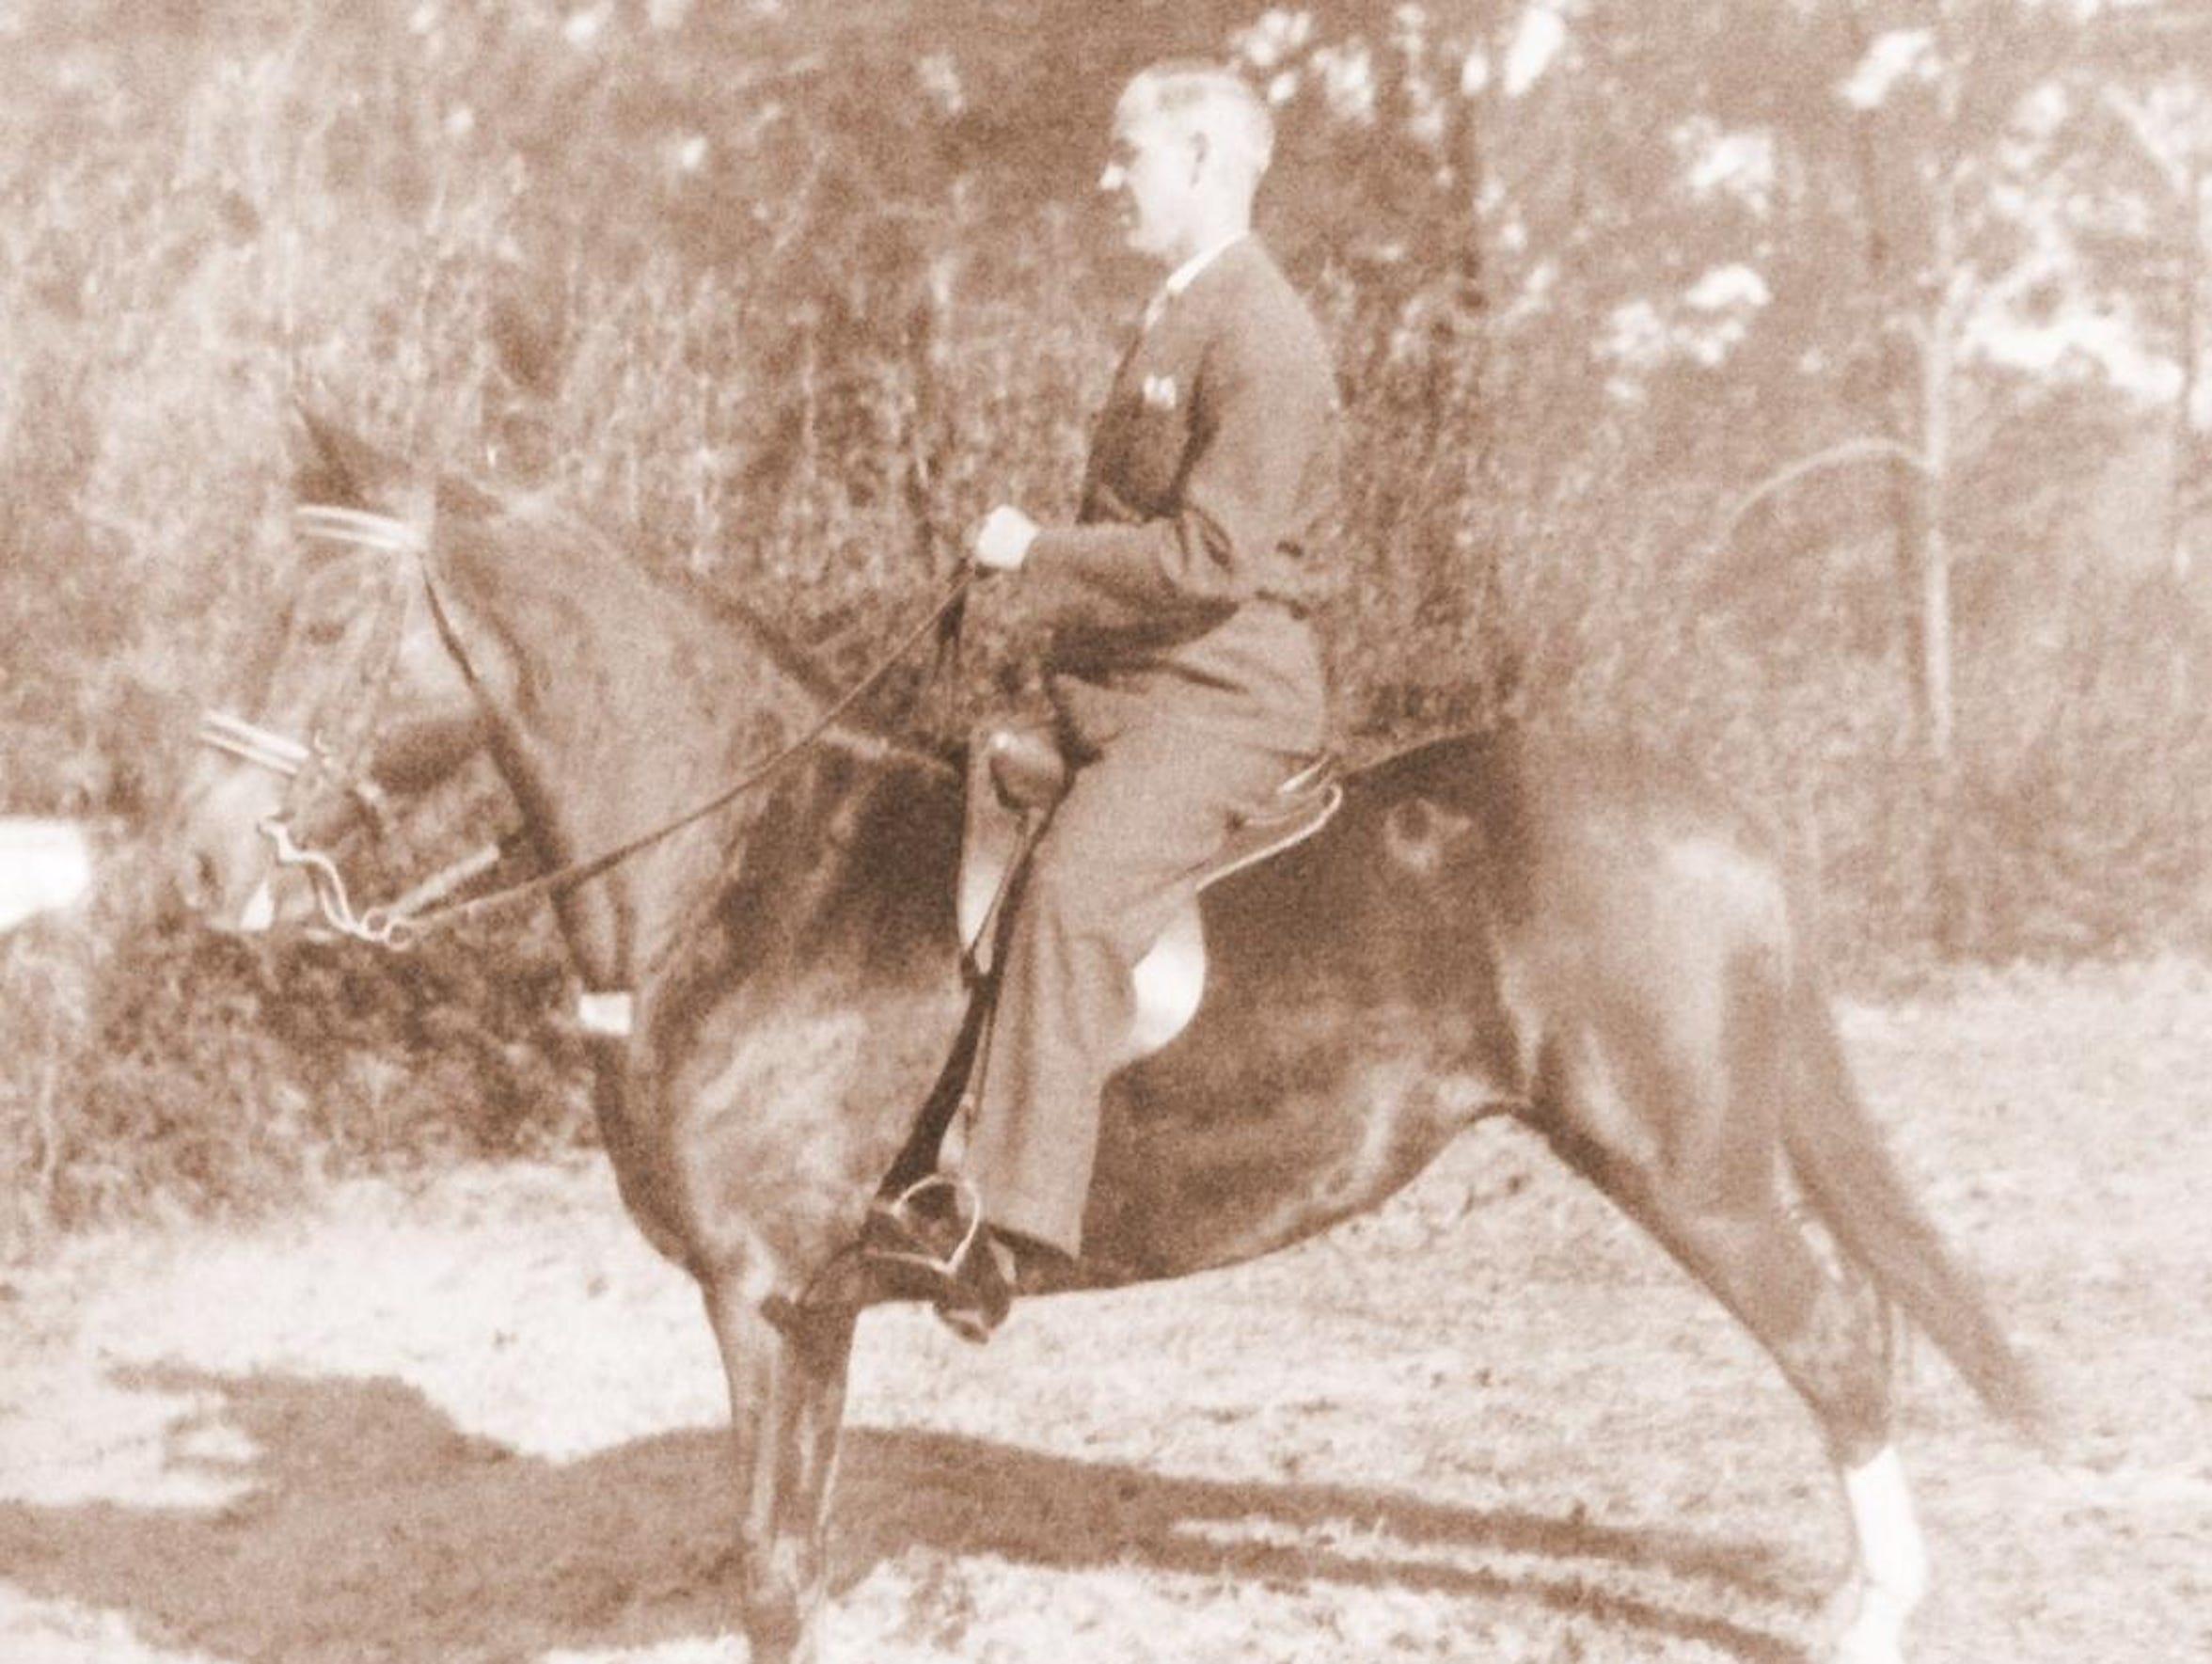 Carole Baxter's grandfather, Roy O. Martin, is shown